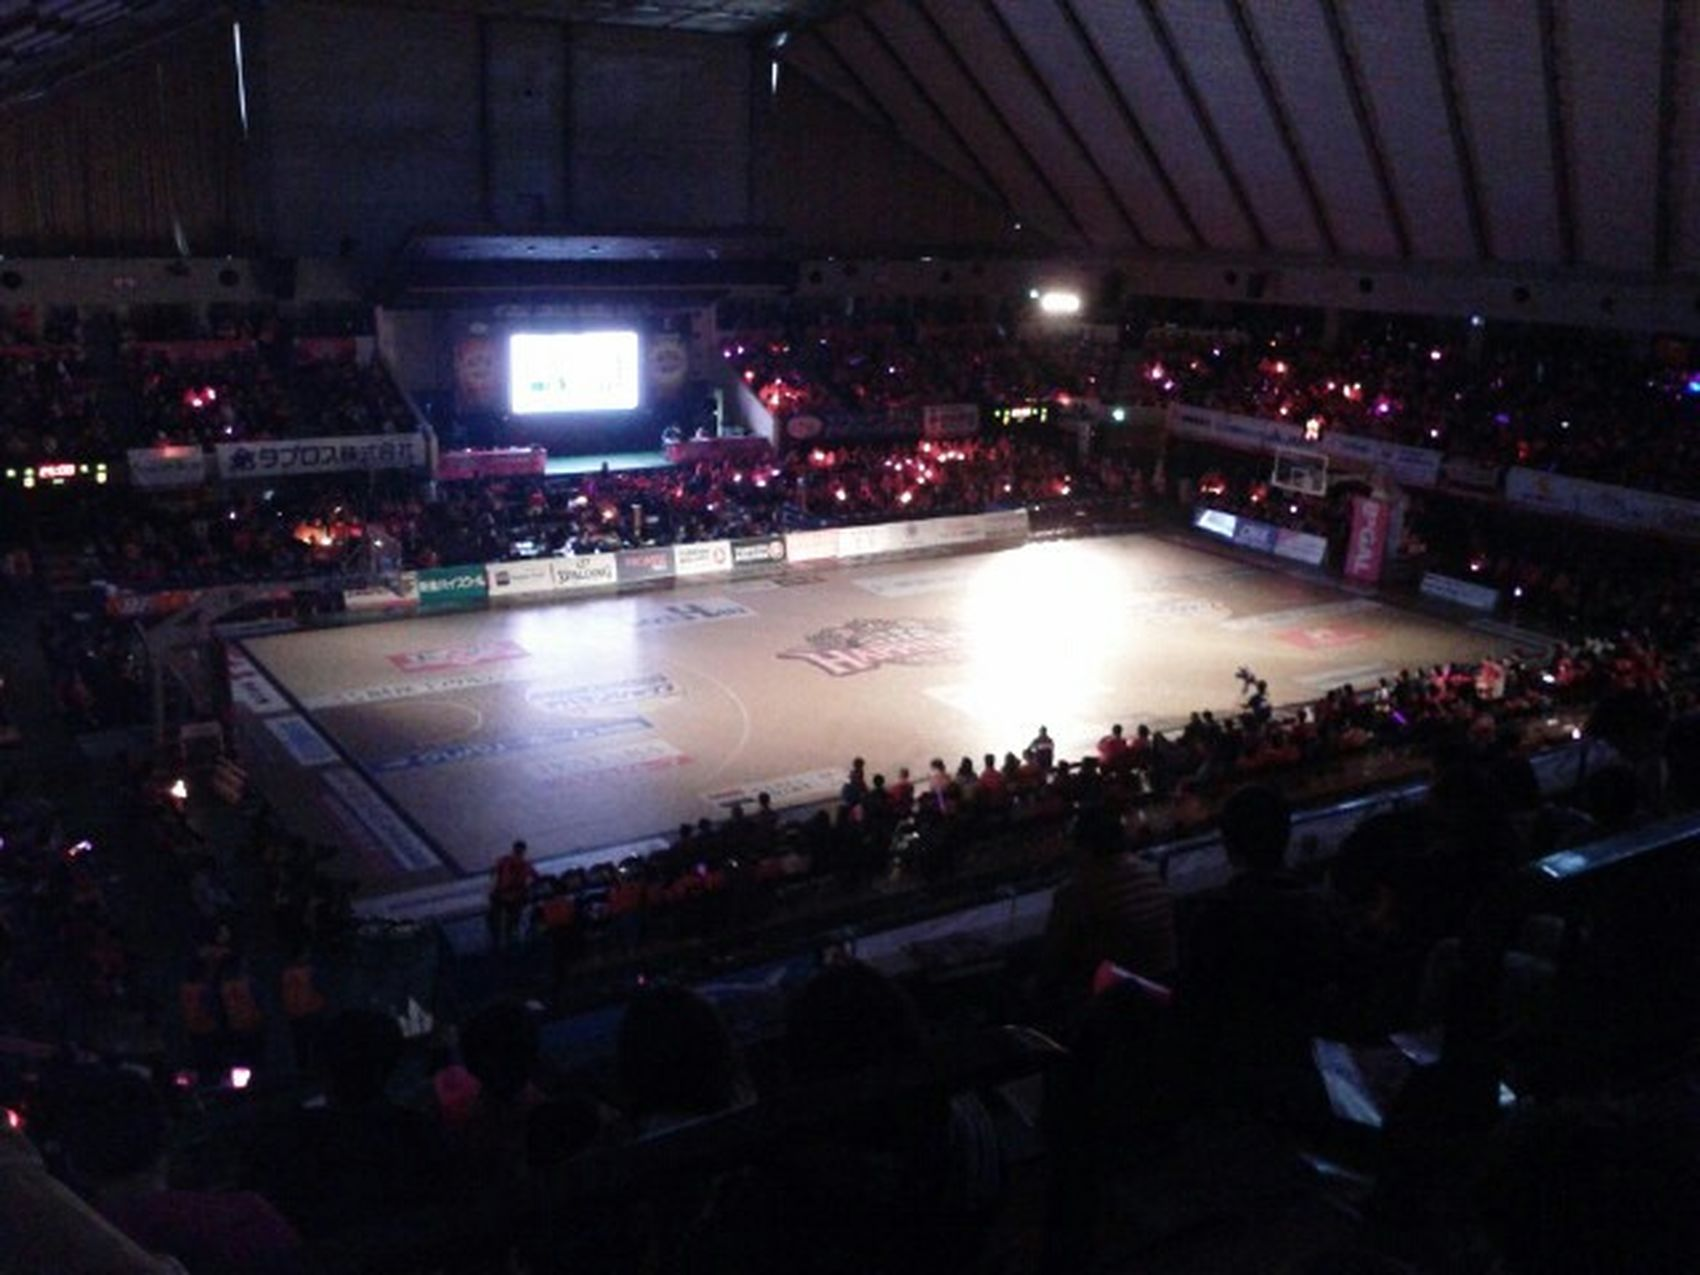 Basketball BJleague 秋田vs新潟 県立体育館